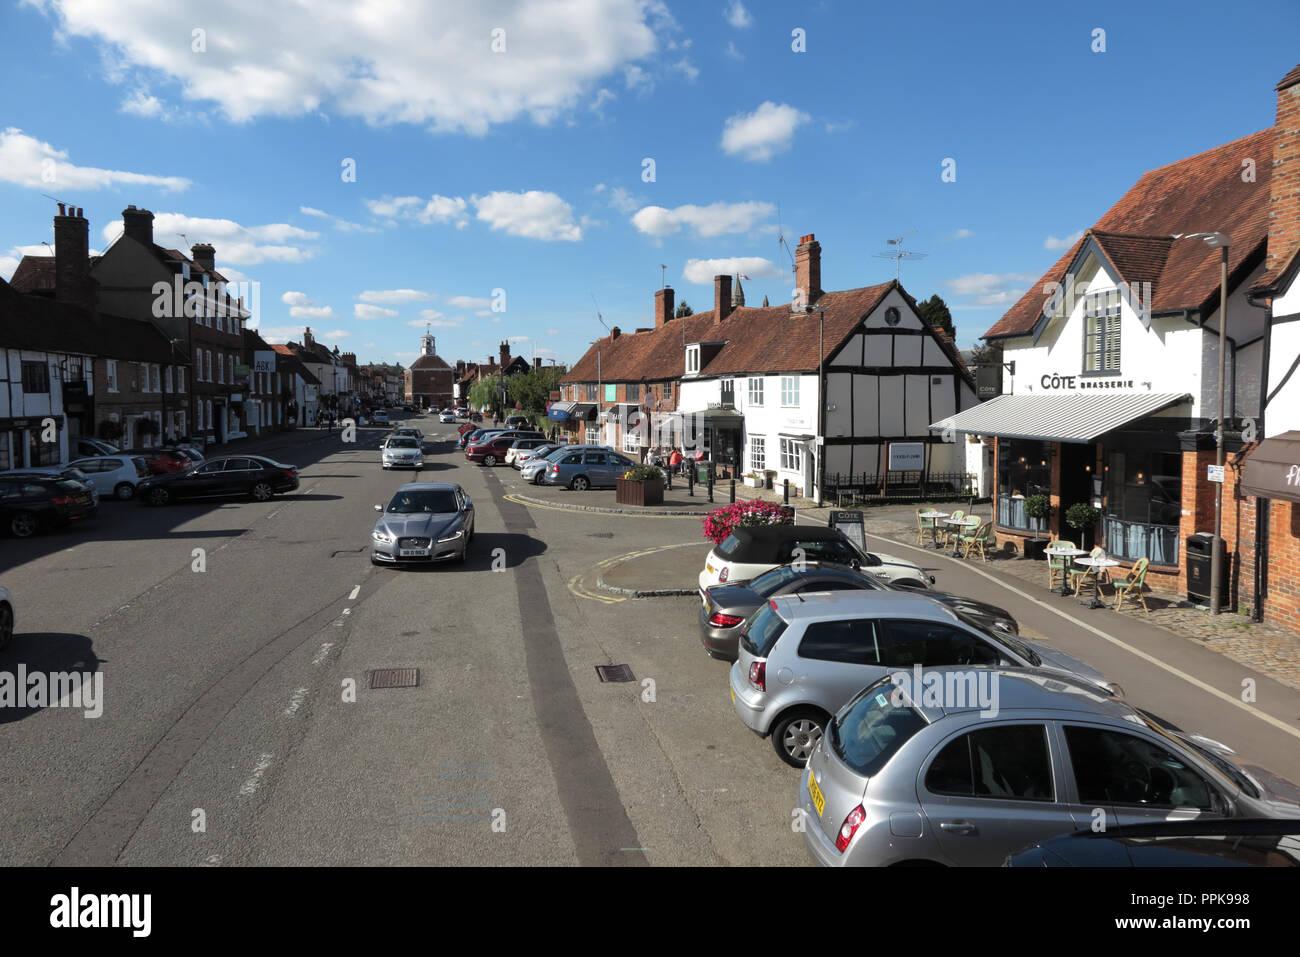 The Broadway, Amersham, Buckinghamshire - Stock Image